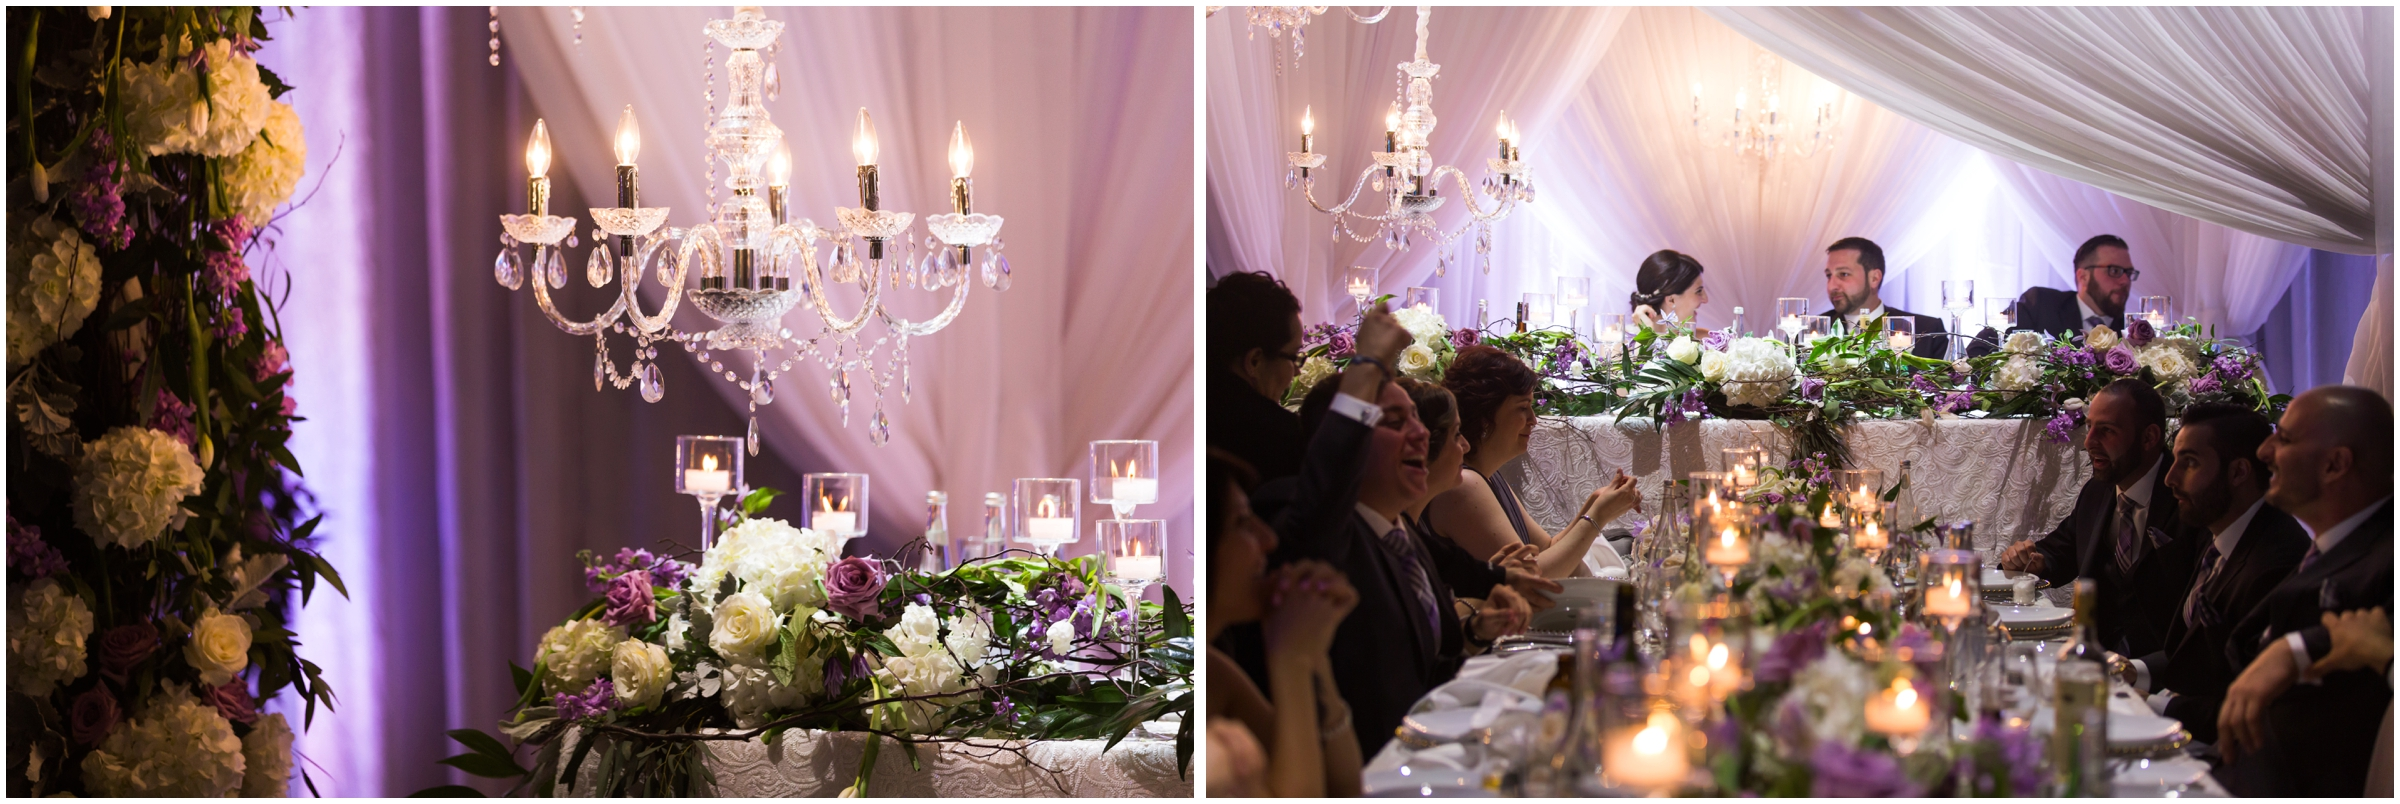 Selena Phillips-Boyle (C&G Wedding)_0129.jpg